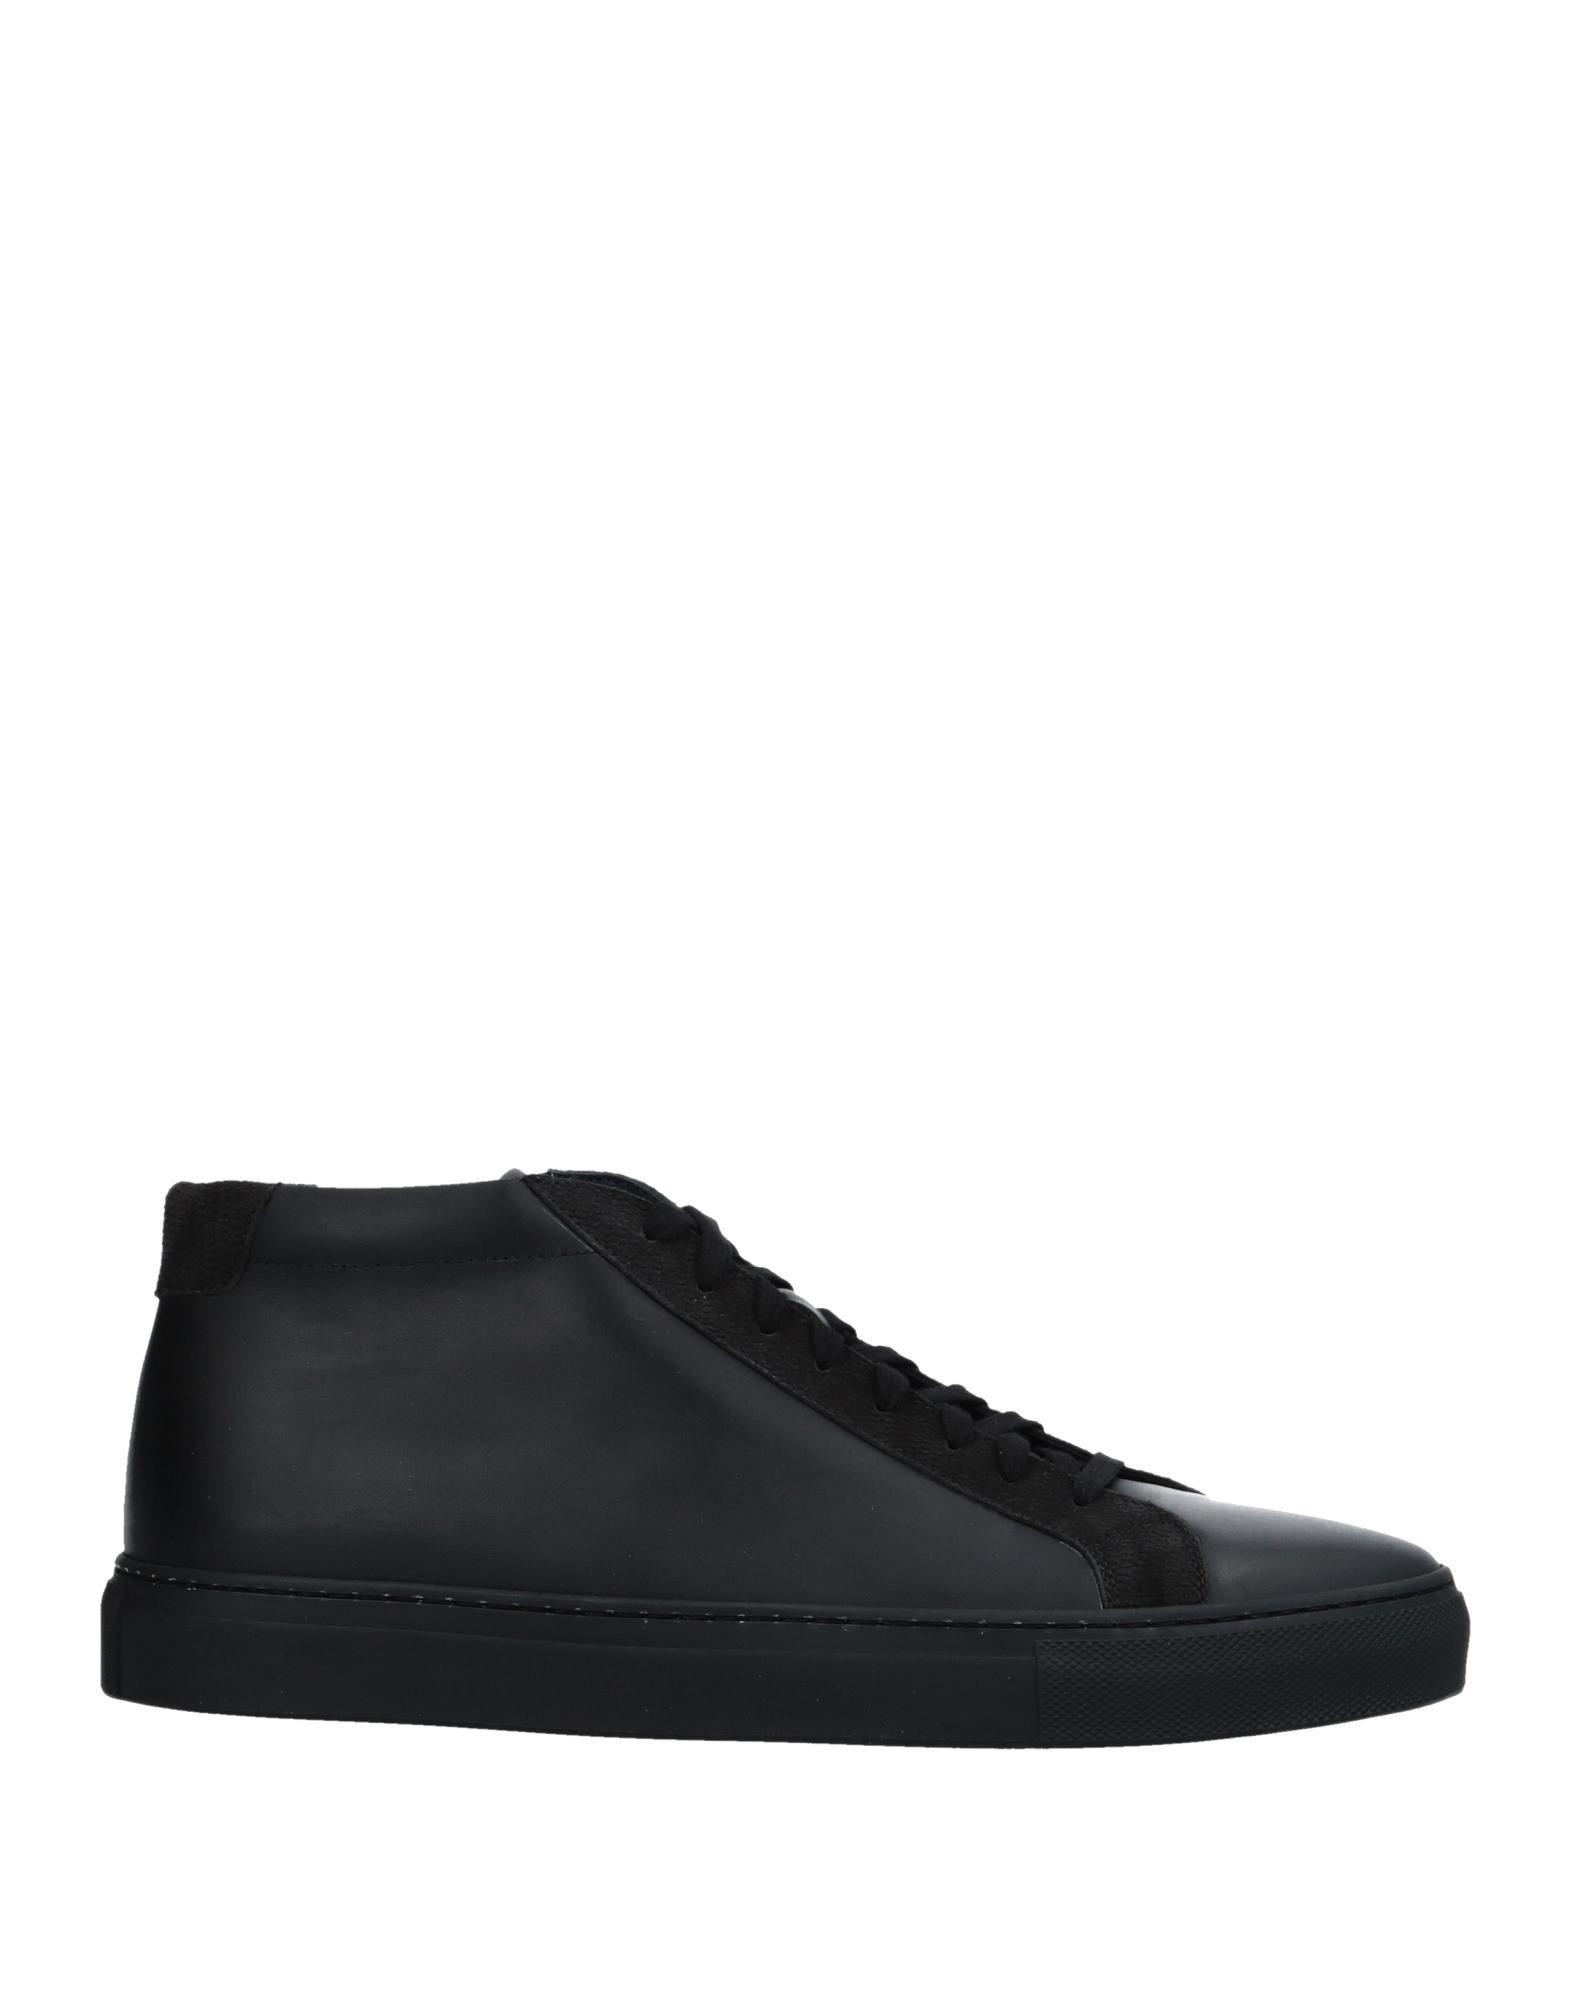 Sneakers Fabiano Ricci Homme - Sneakers Fabiano Ricci  Noir Chaussures femme pas cher homme et femme